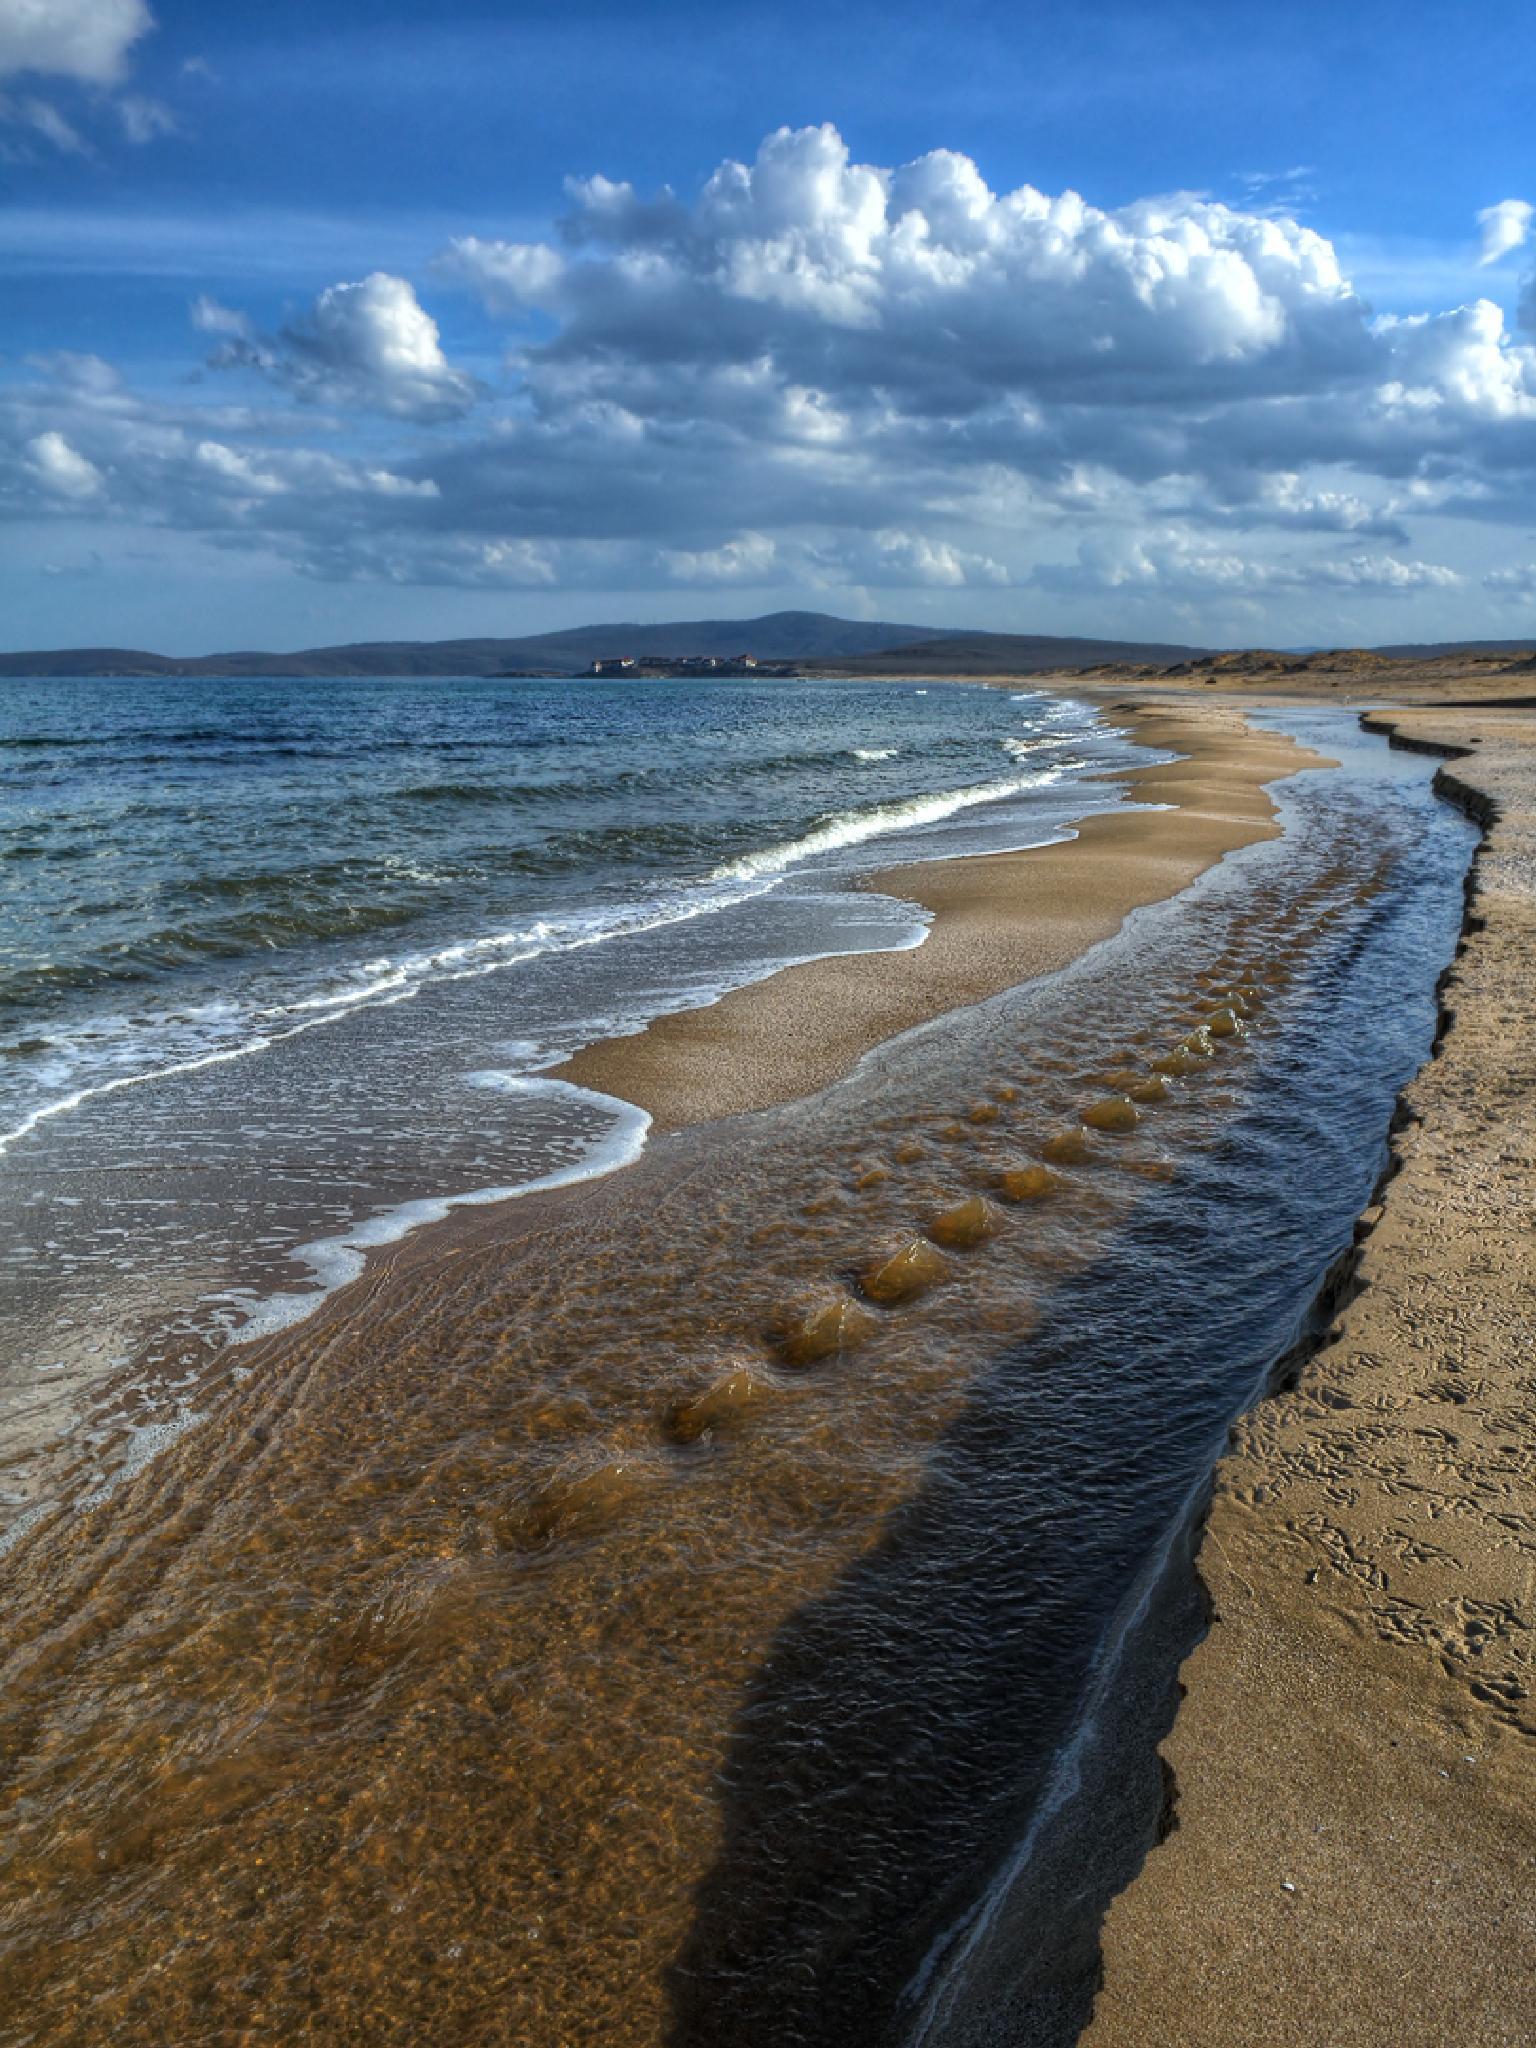 Black Sea view by dimitarrusevdr